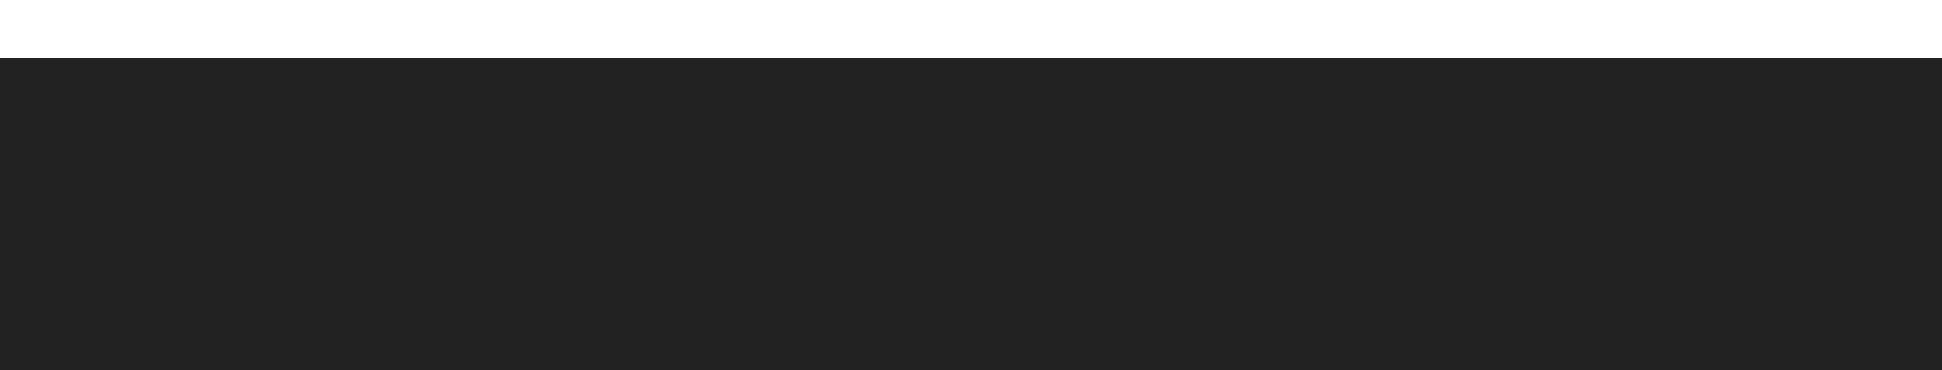 TeePublic-Logo-6.png